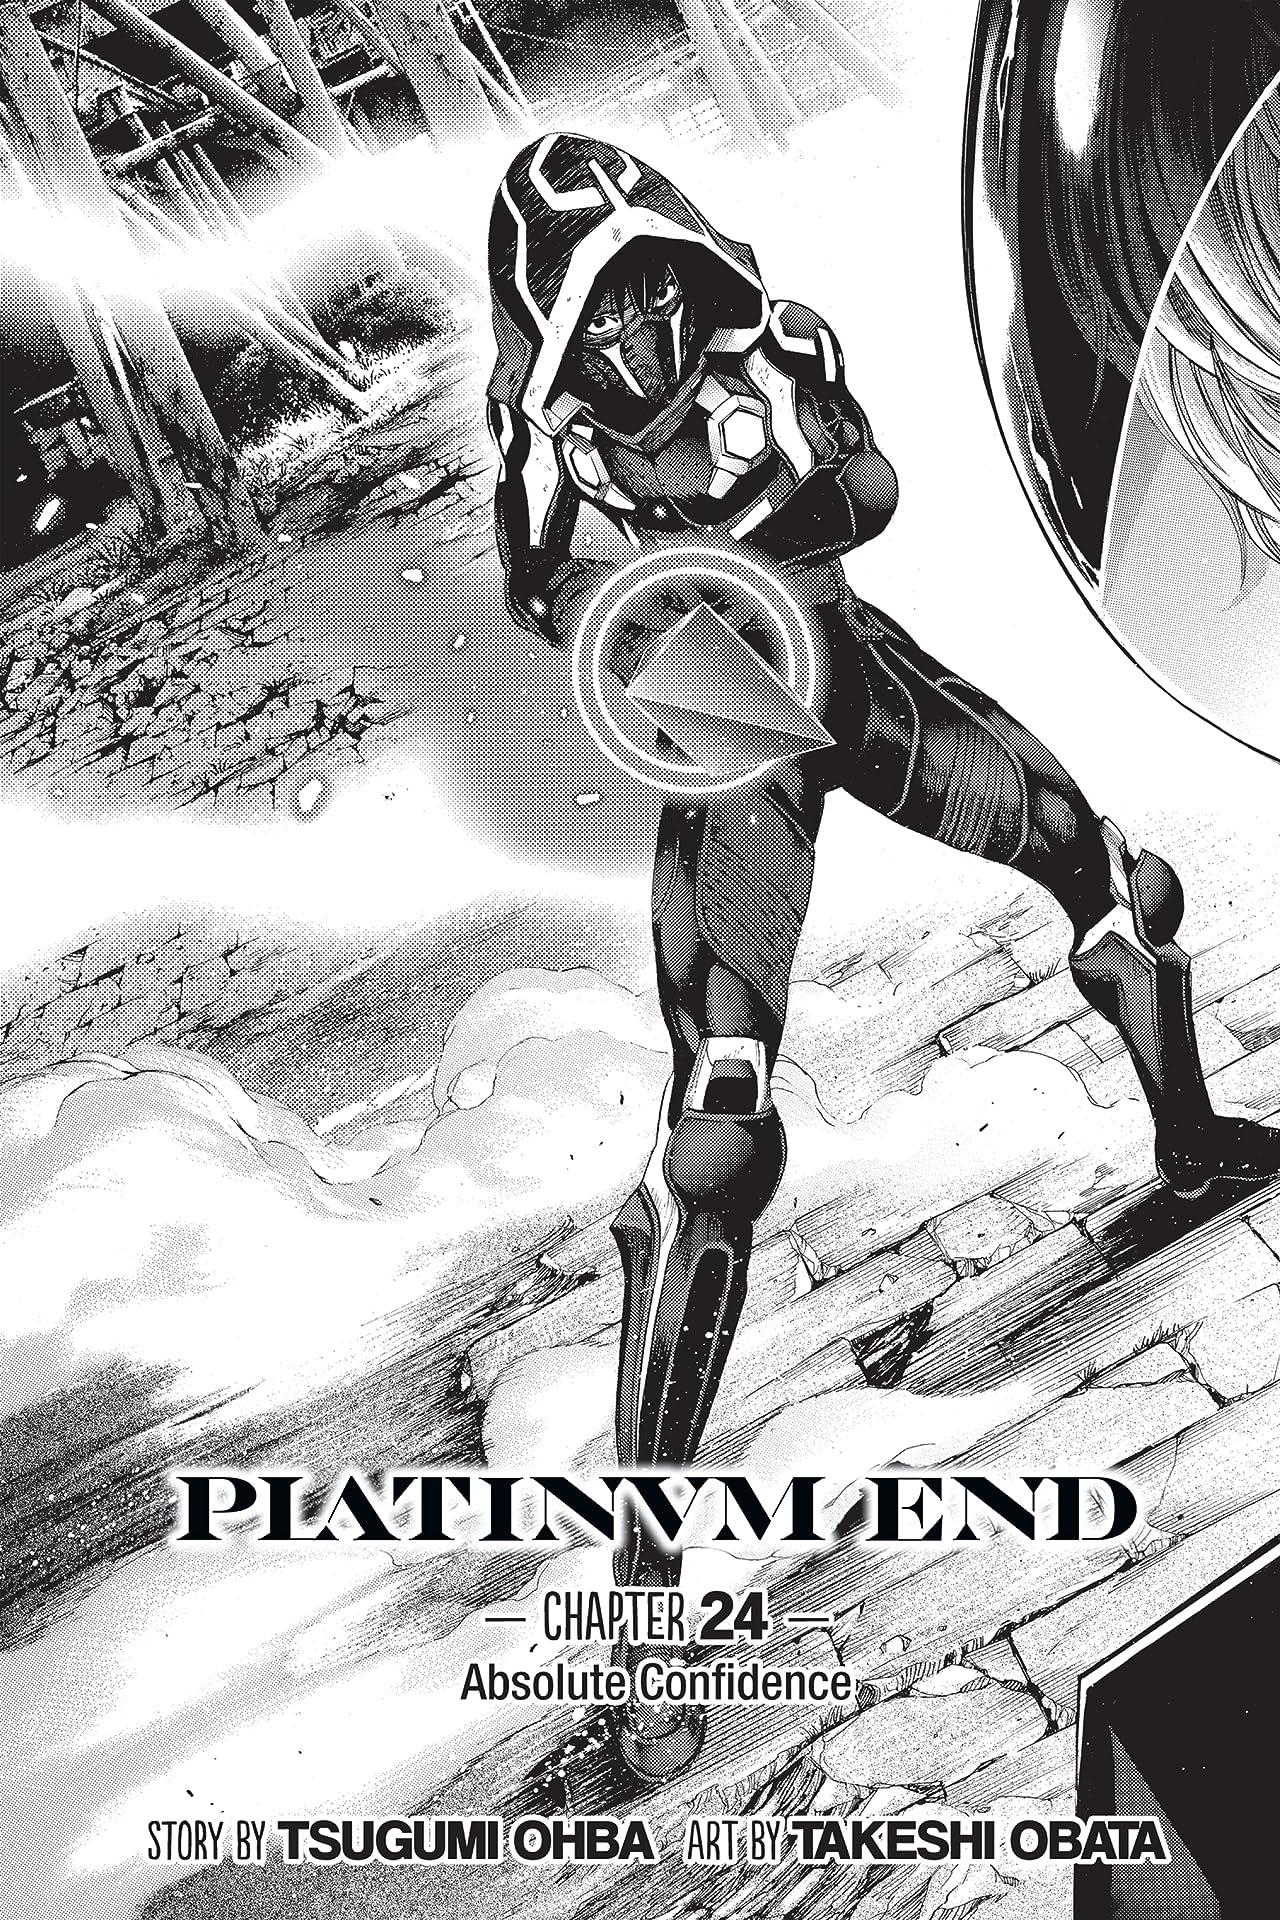 Platinum End: Chapter 24